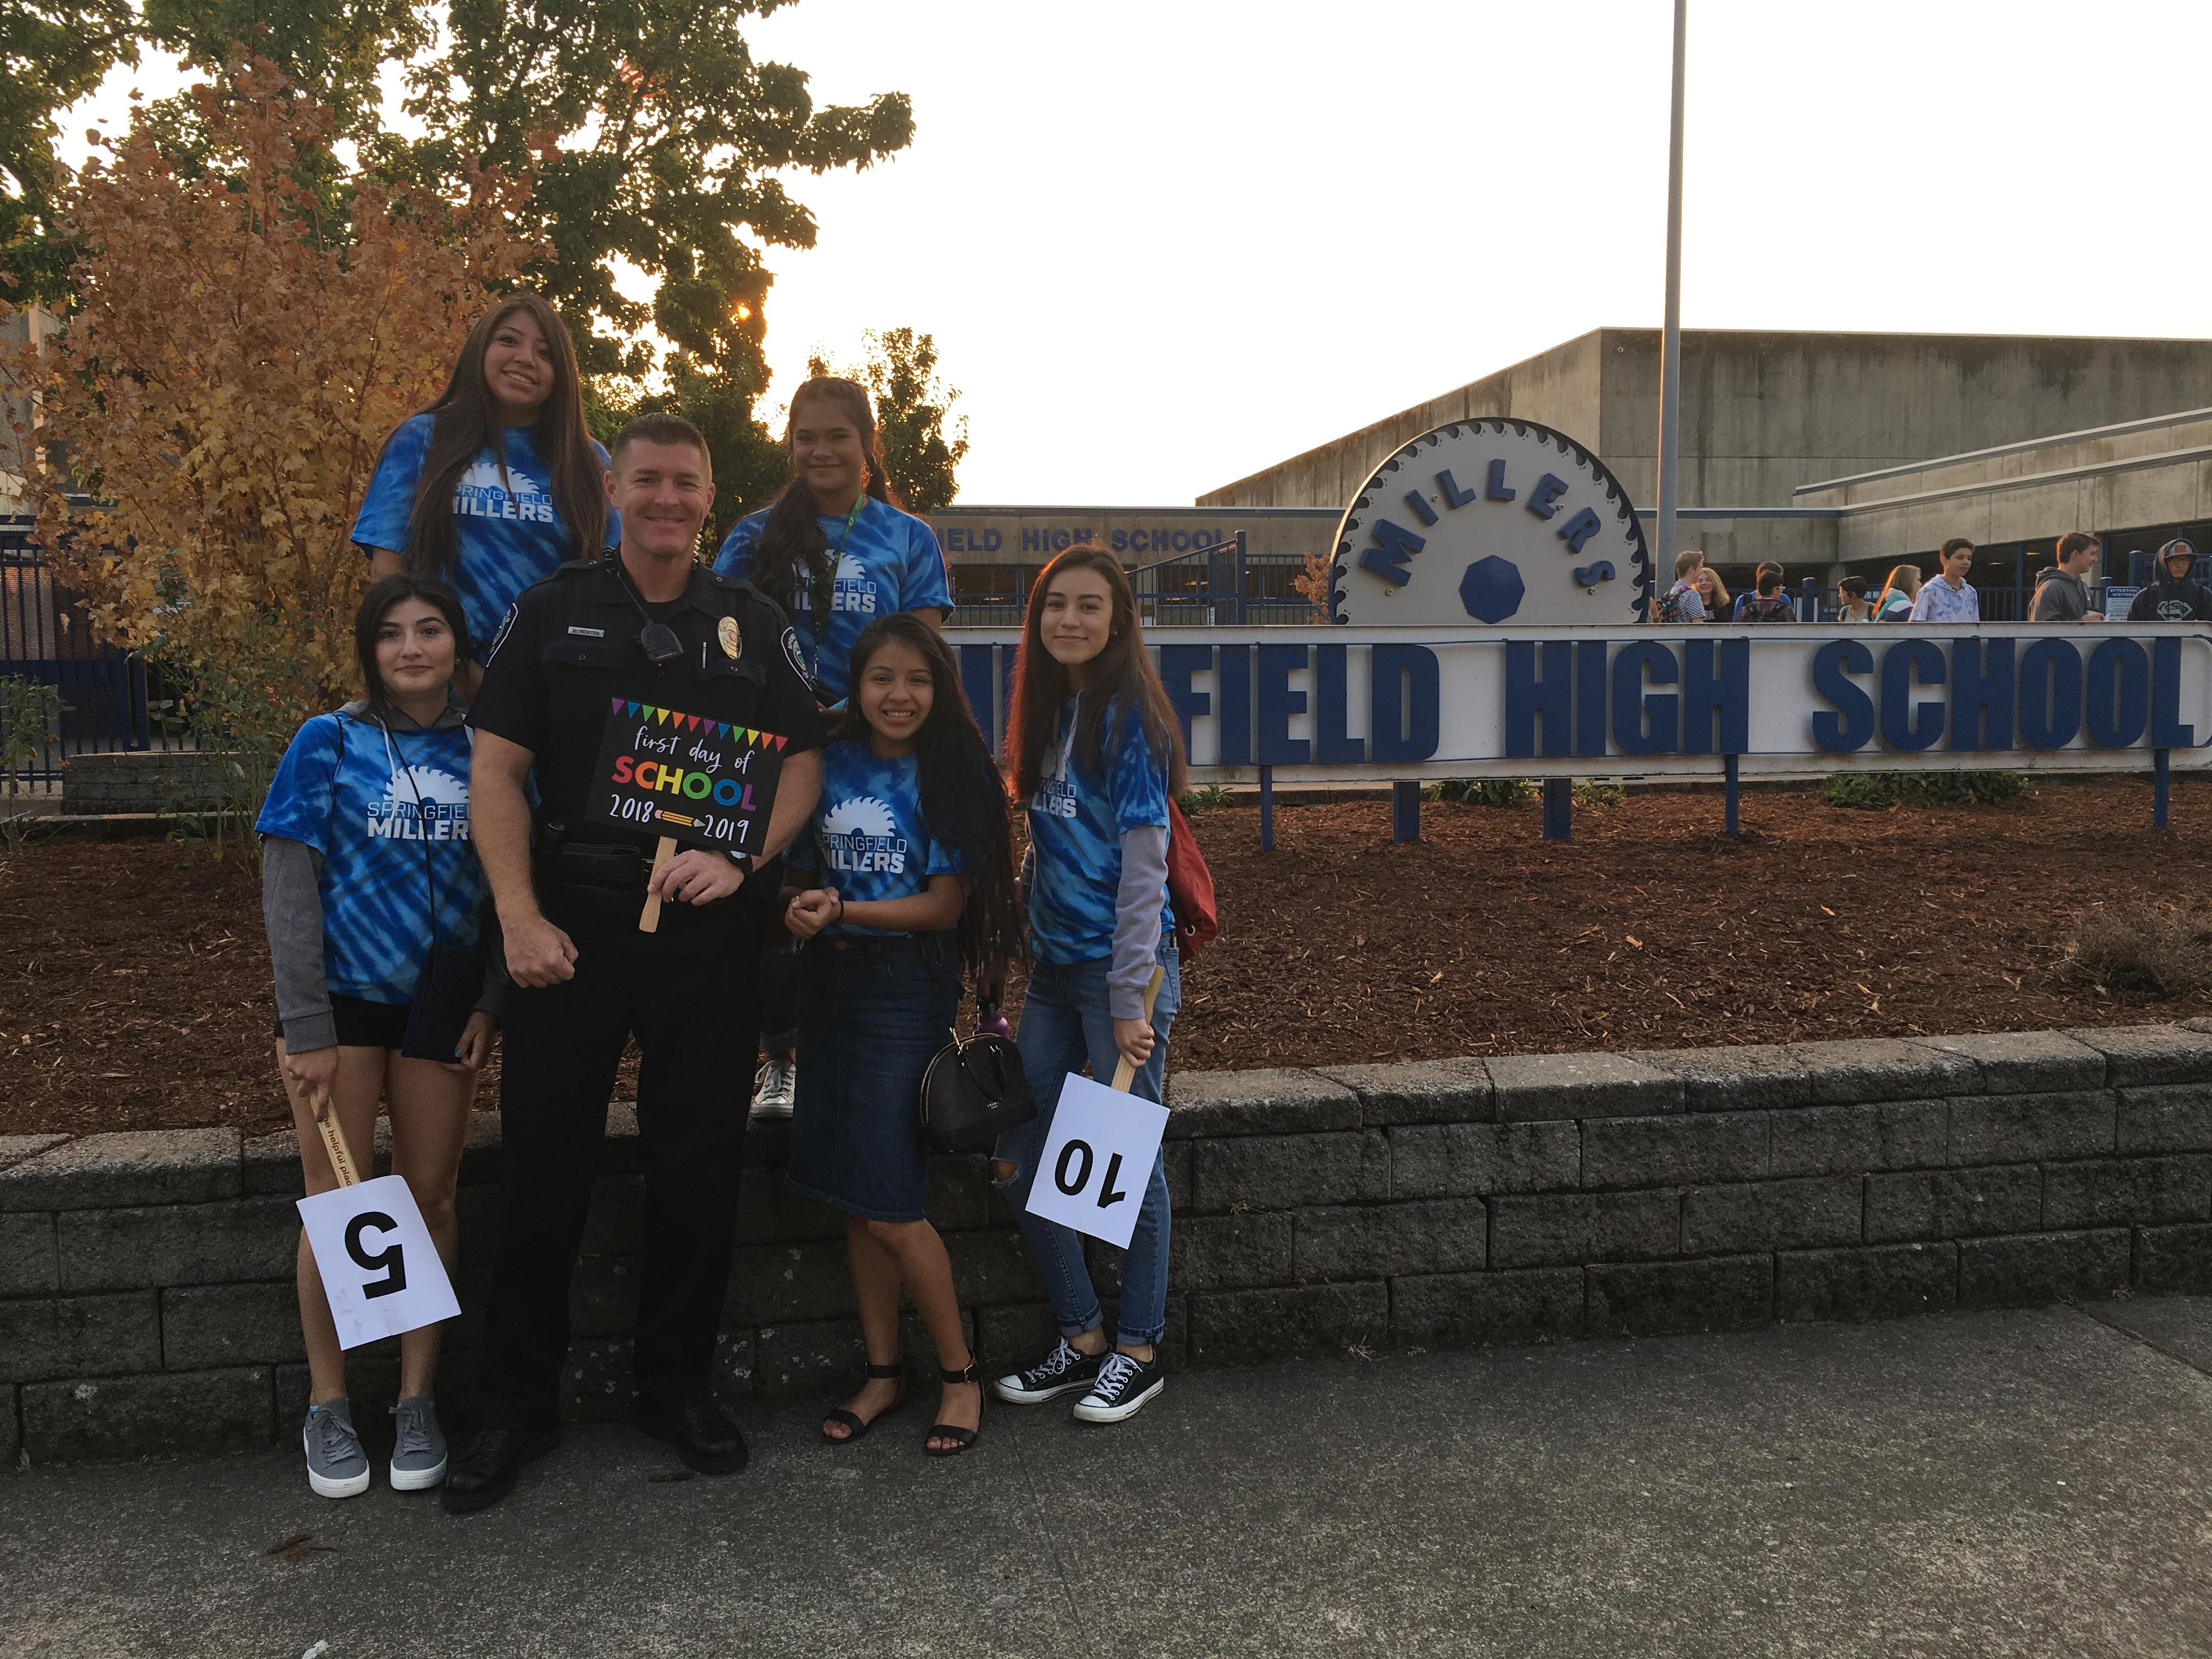 School Resource Officers – City of Springfield Oregon